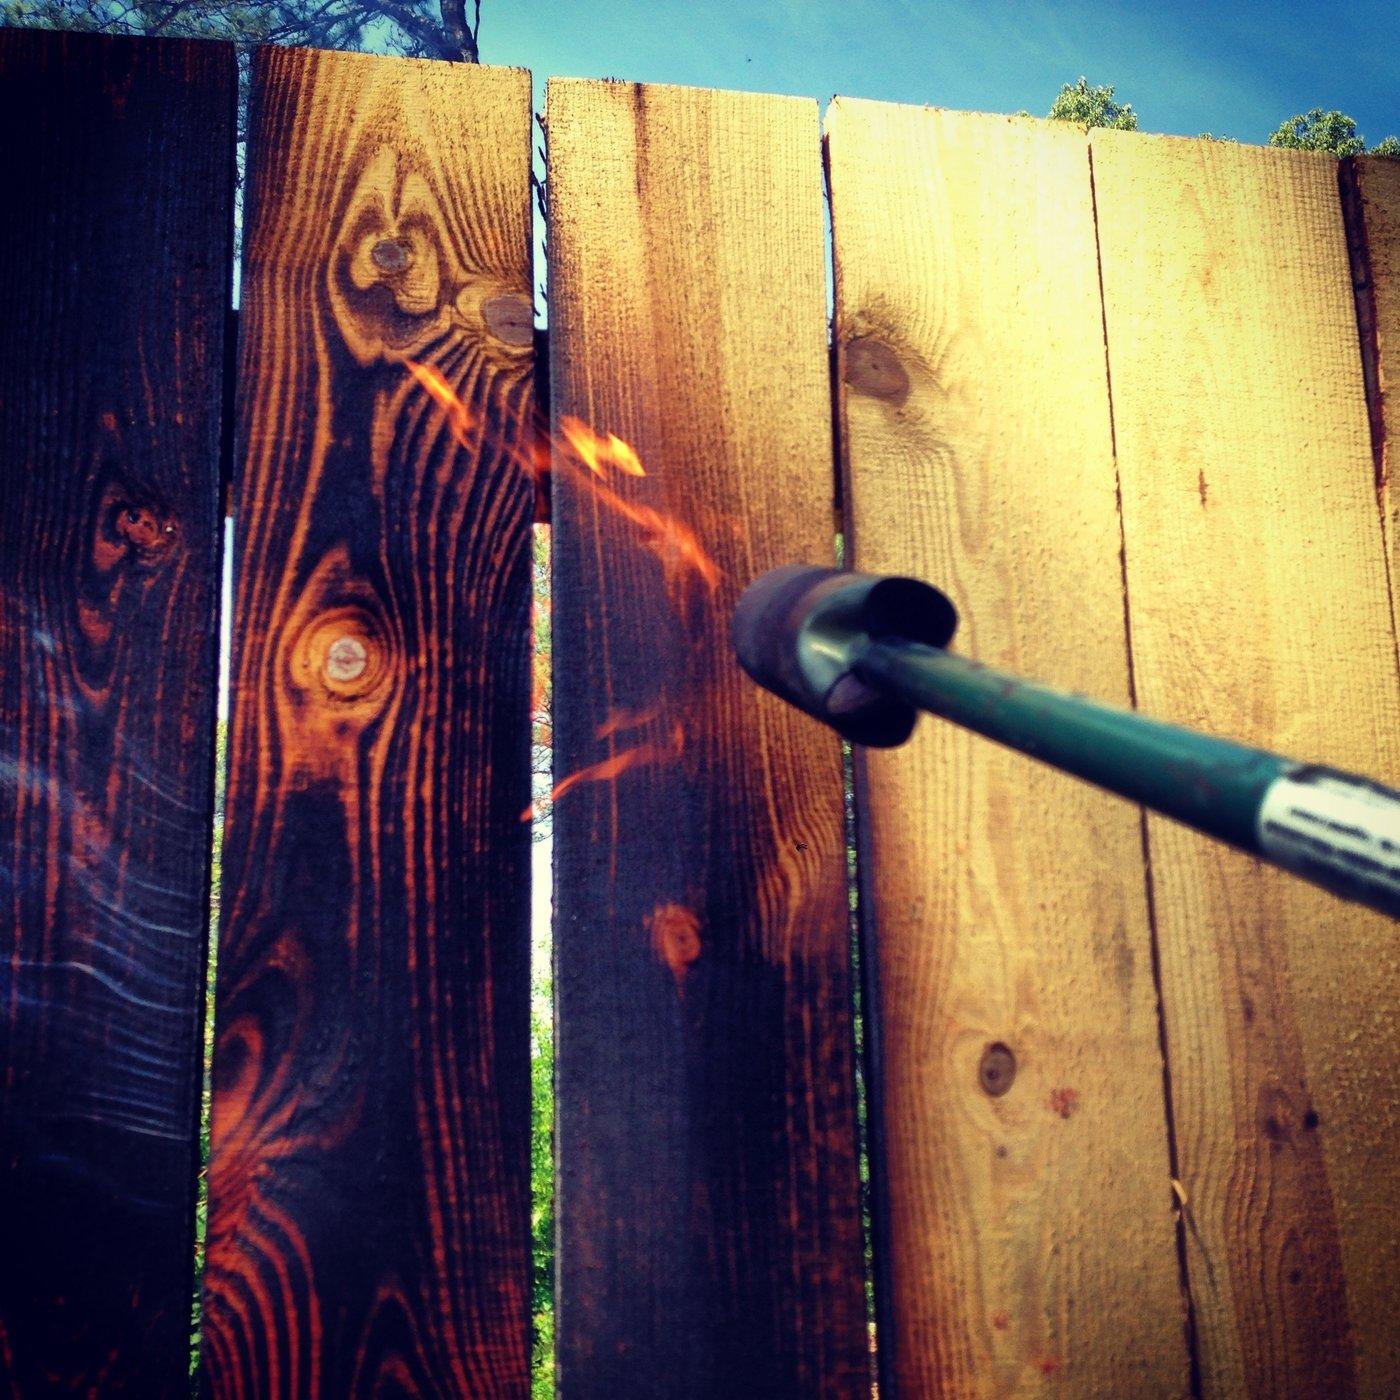 Shou Sugi Ban Fence By Andrew Drake At Coroflot Com